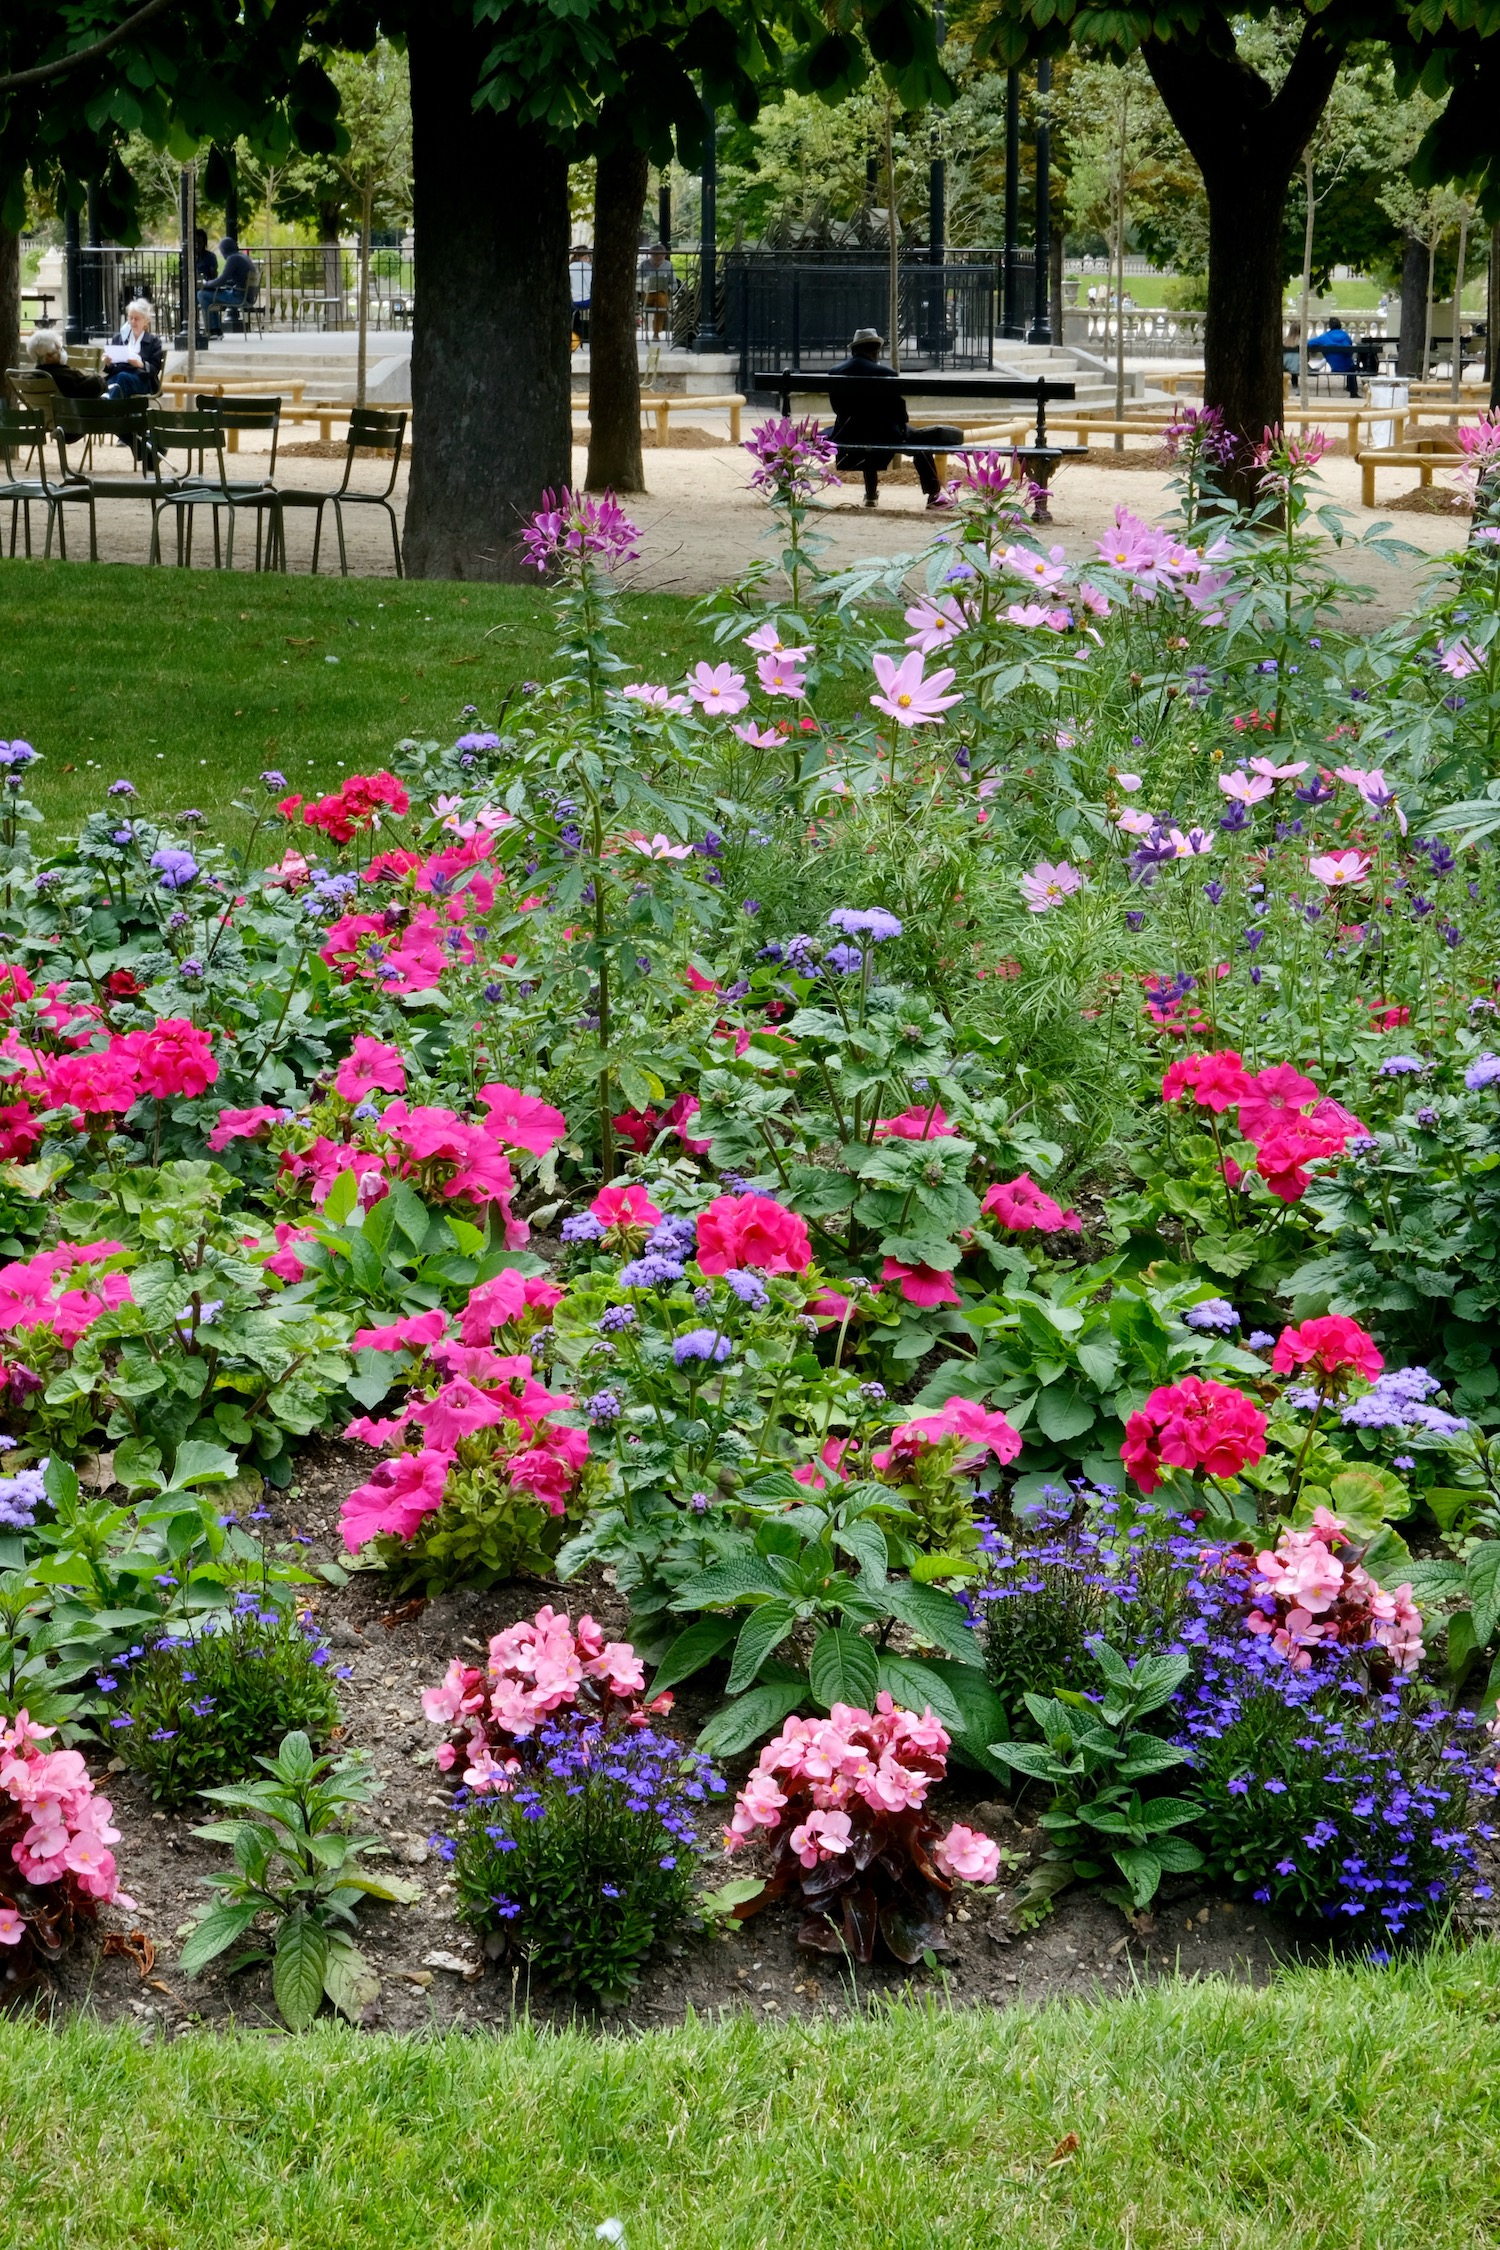 Luxembourg Garden flower beds